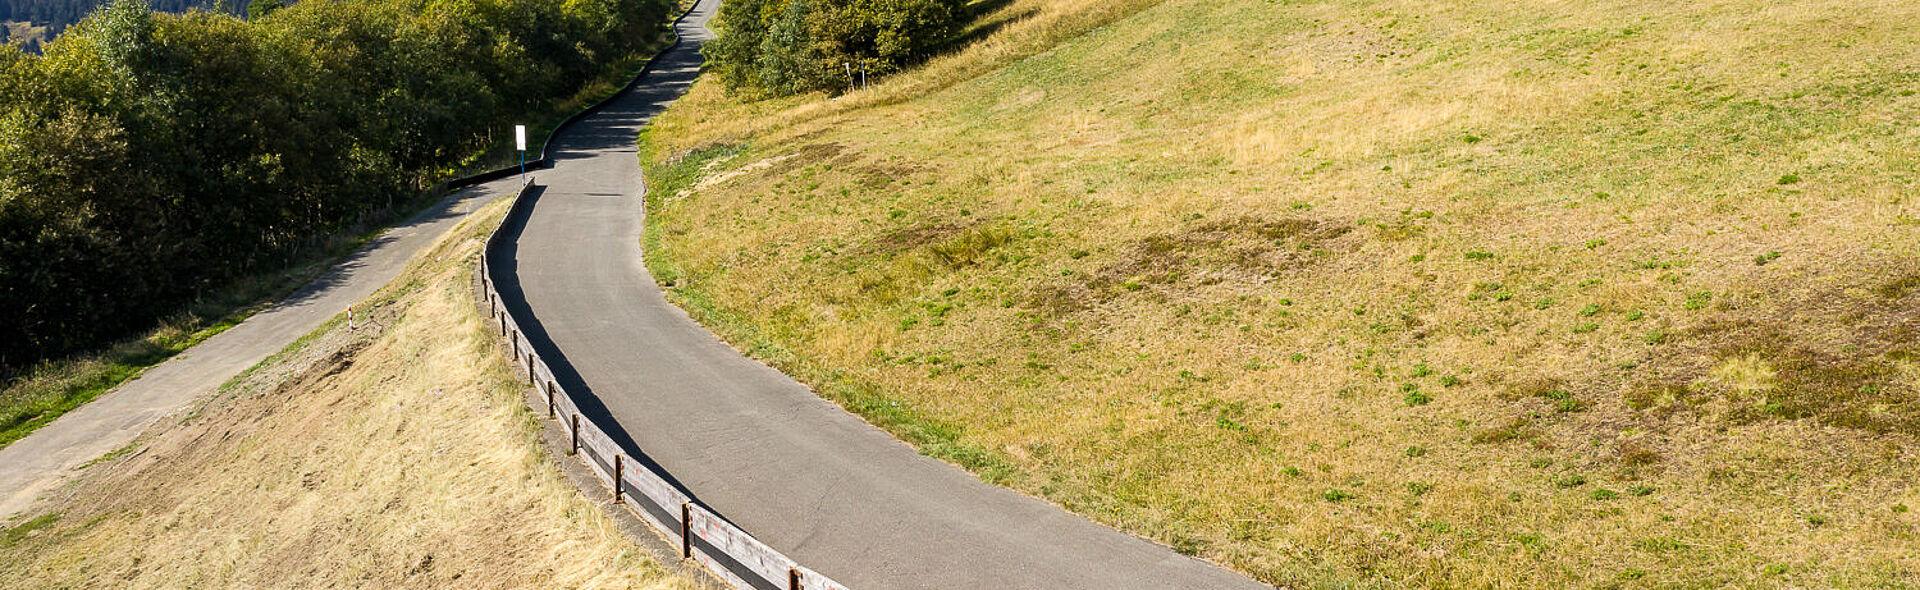 Rennschlitten Rennrodeln Oberwiesenthal Trainingszentrum